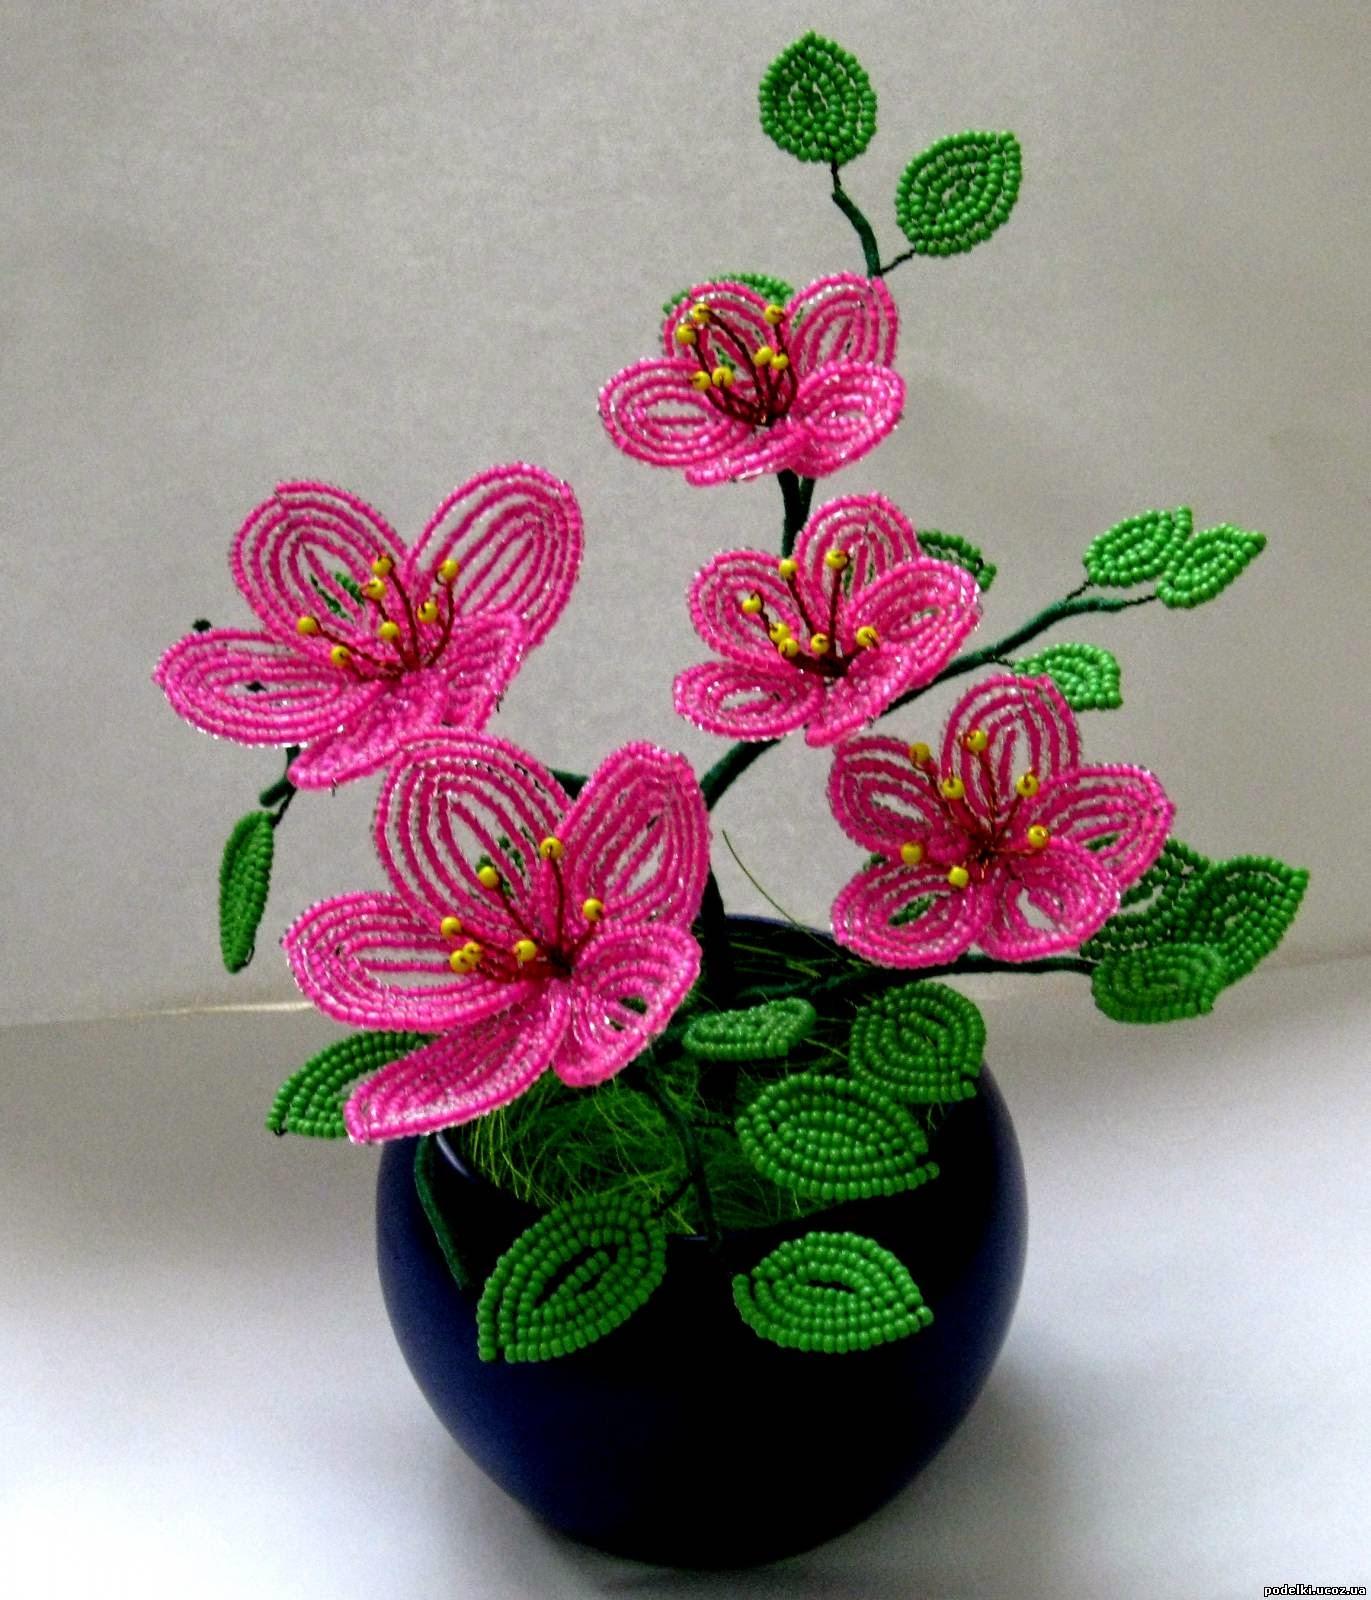 гвоздика цветок для сада